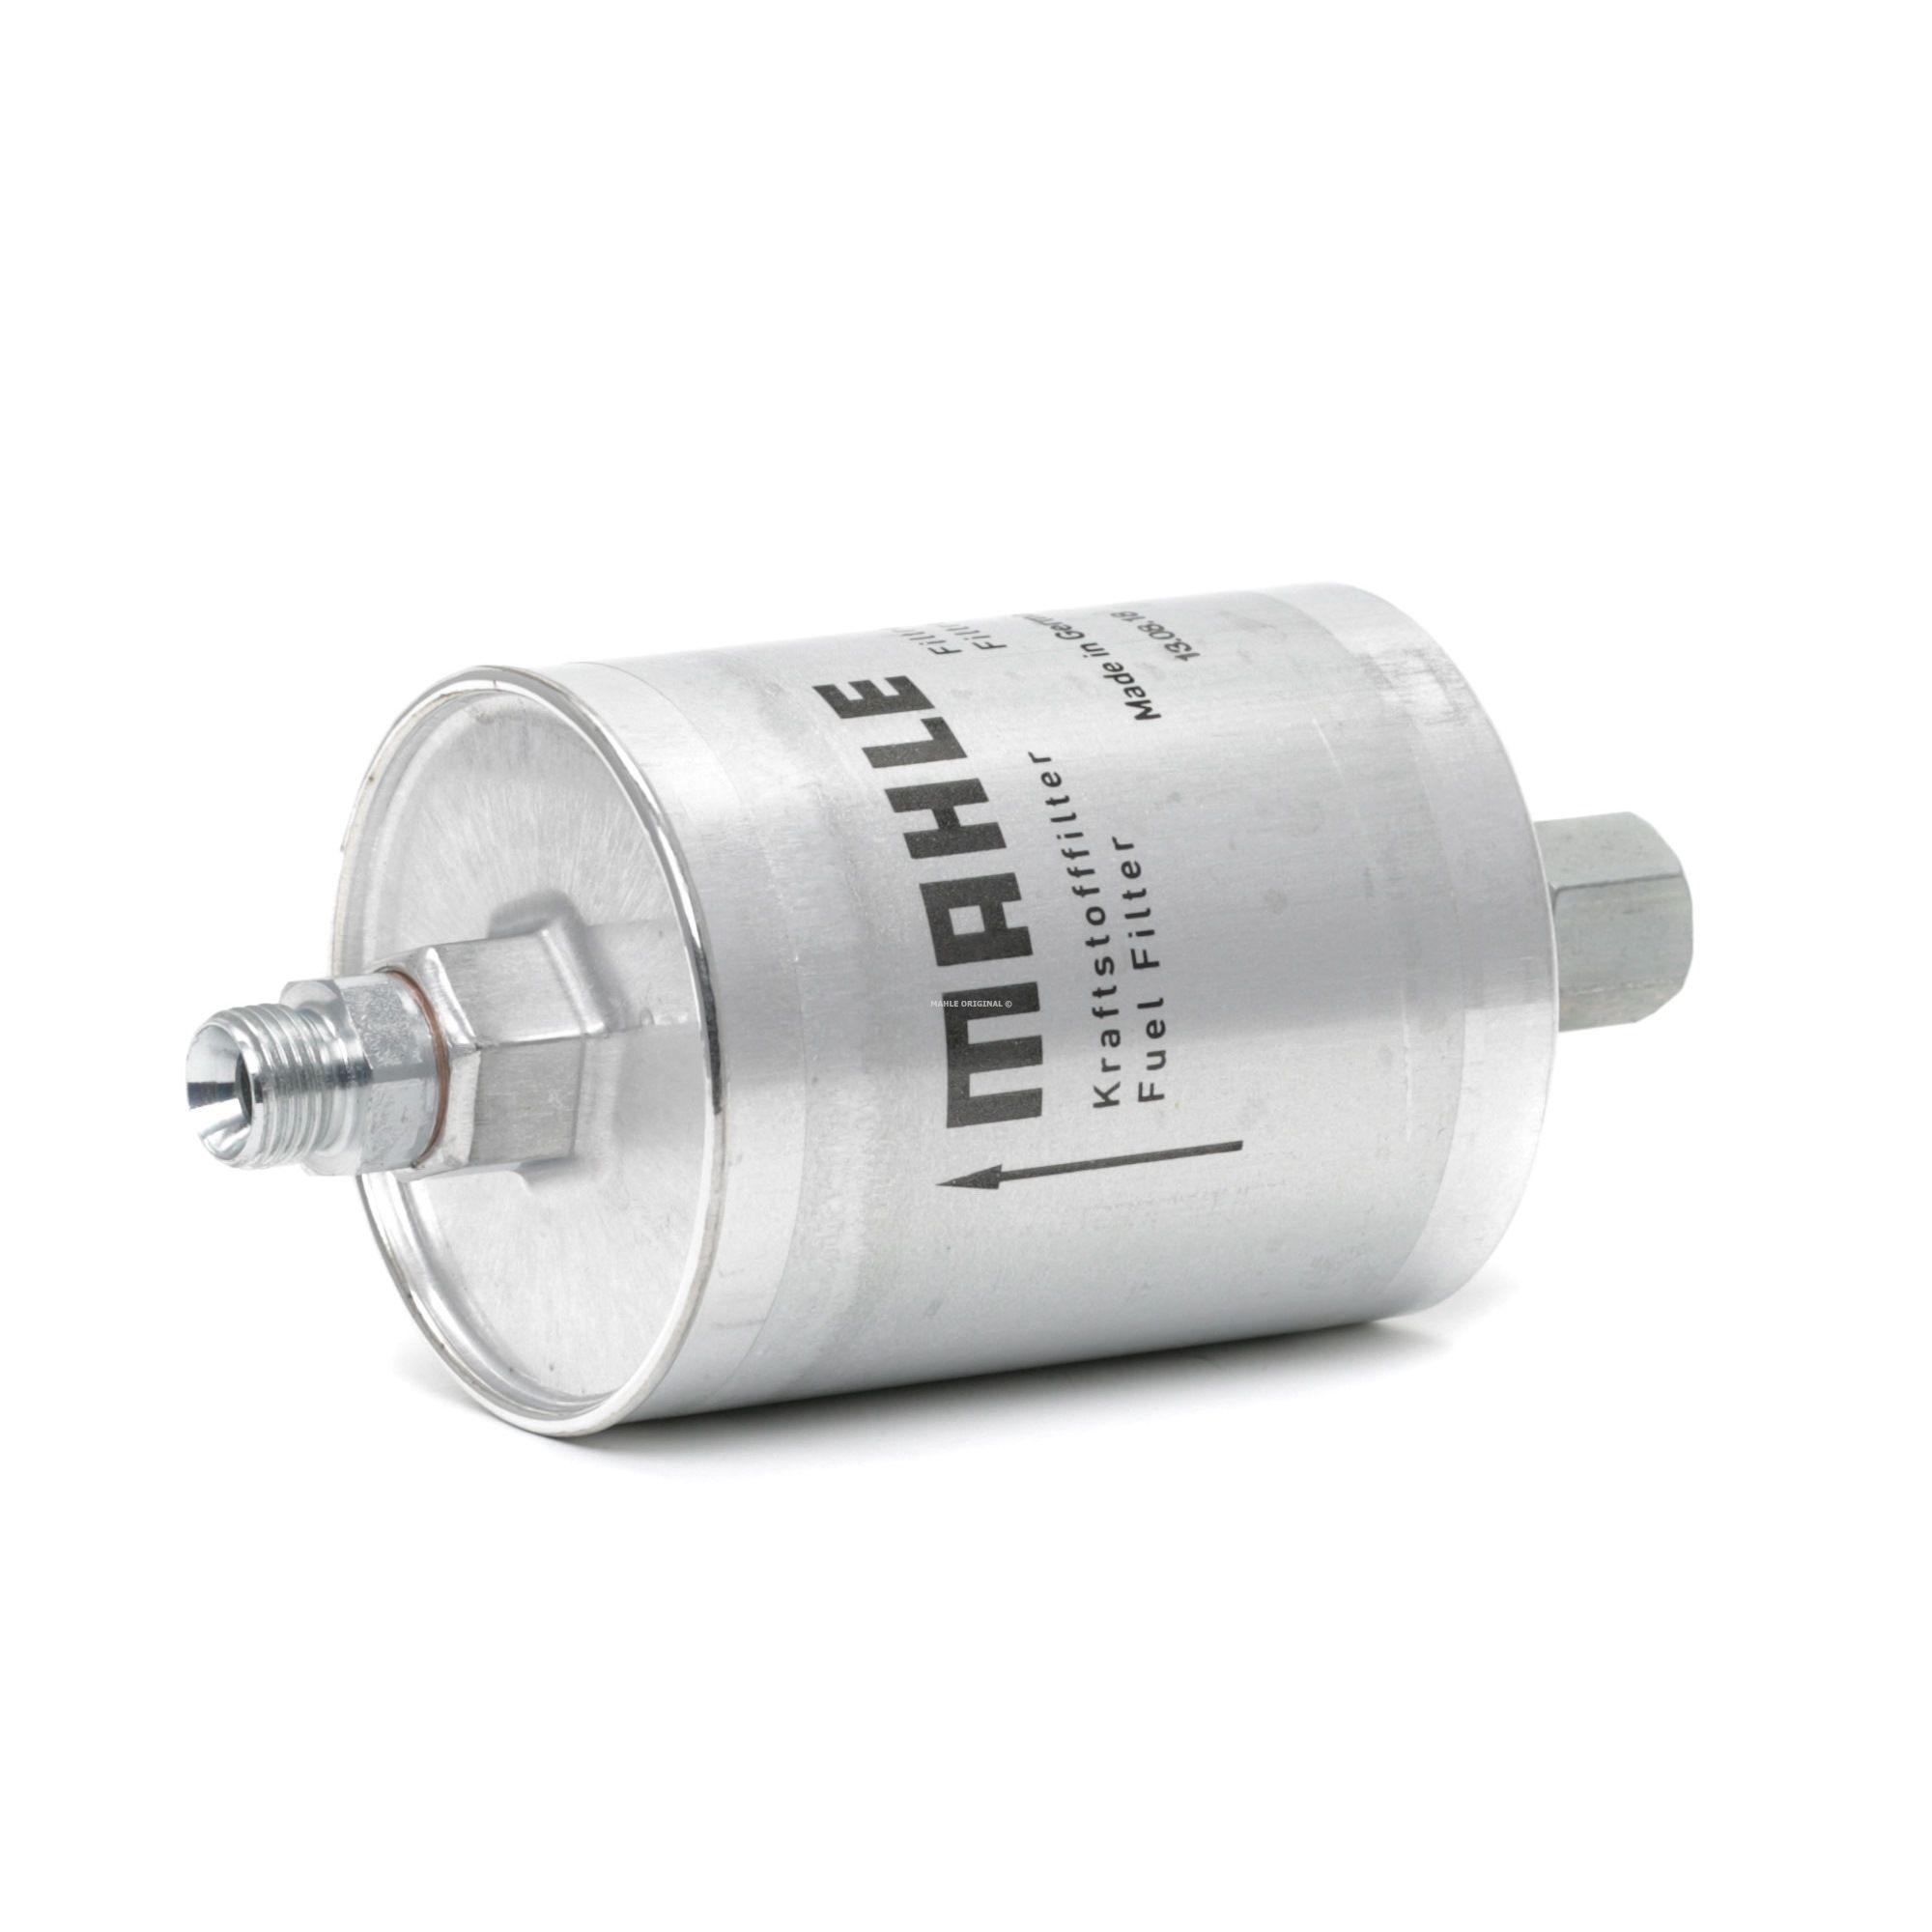 MAHLE ORIGINAL: Original Spritfilter KL 21 (Höhe: 164mm)